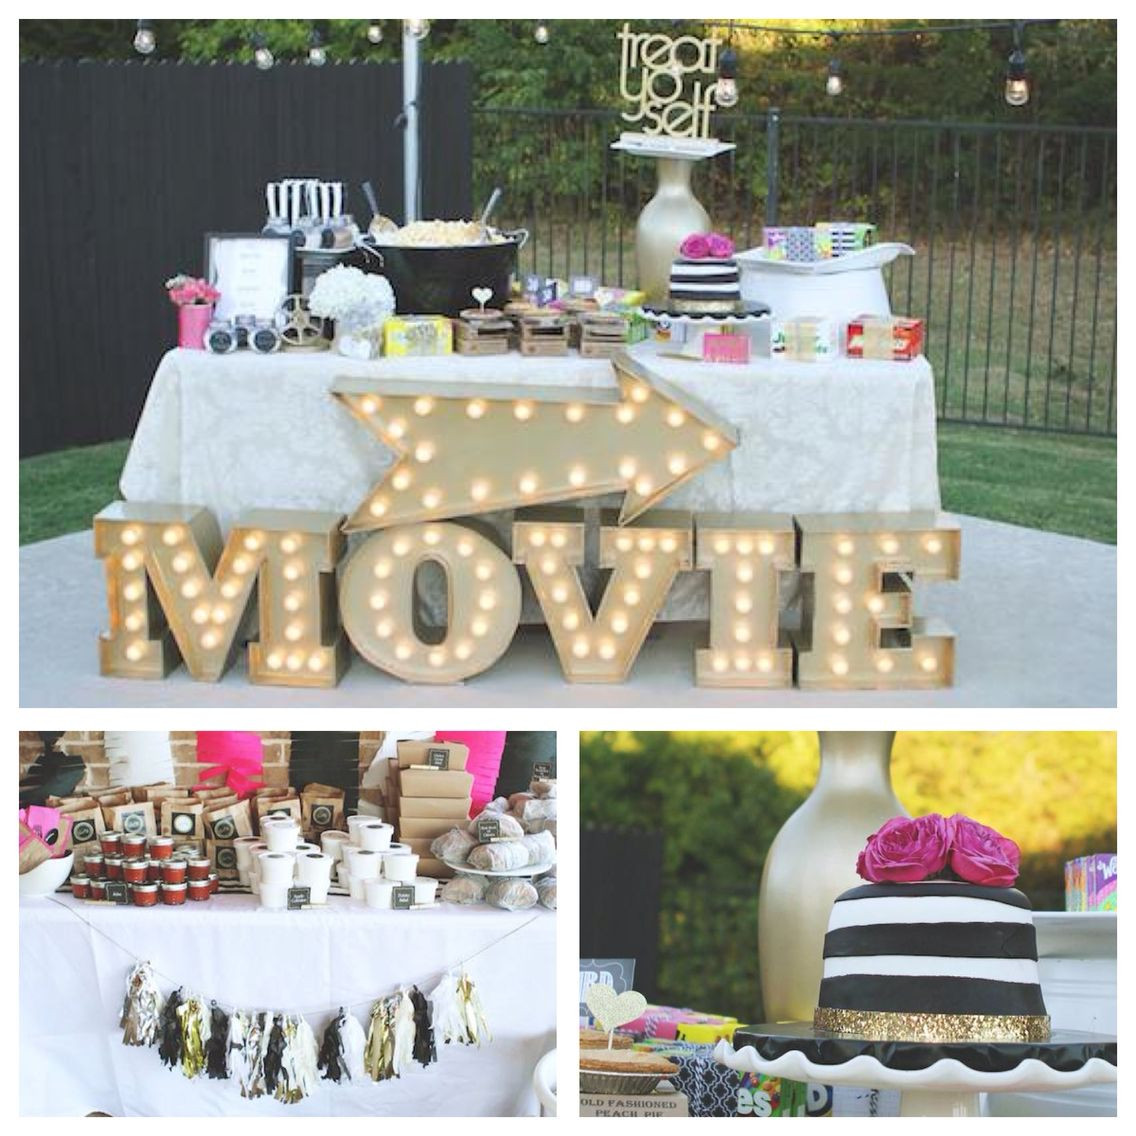 Pinterest Backyard Party Ideas  Outdoor Movie Party on Pinterest